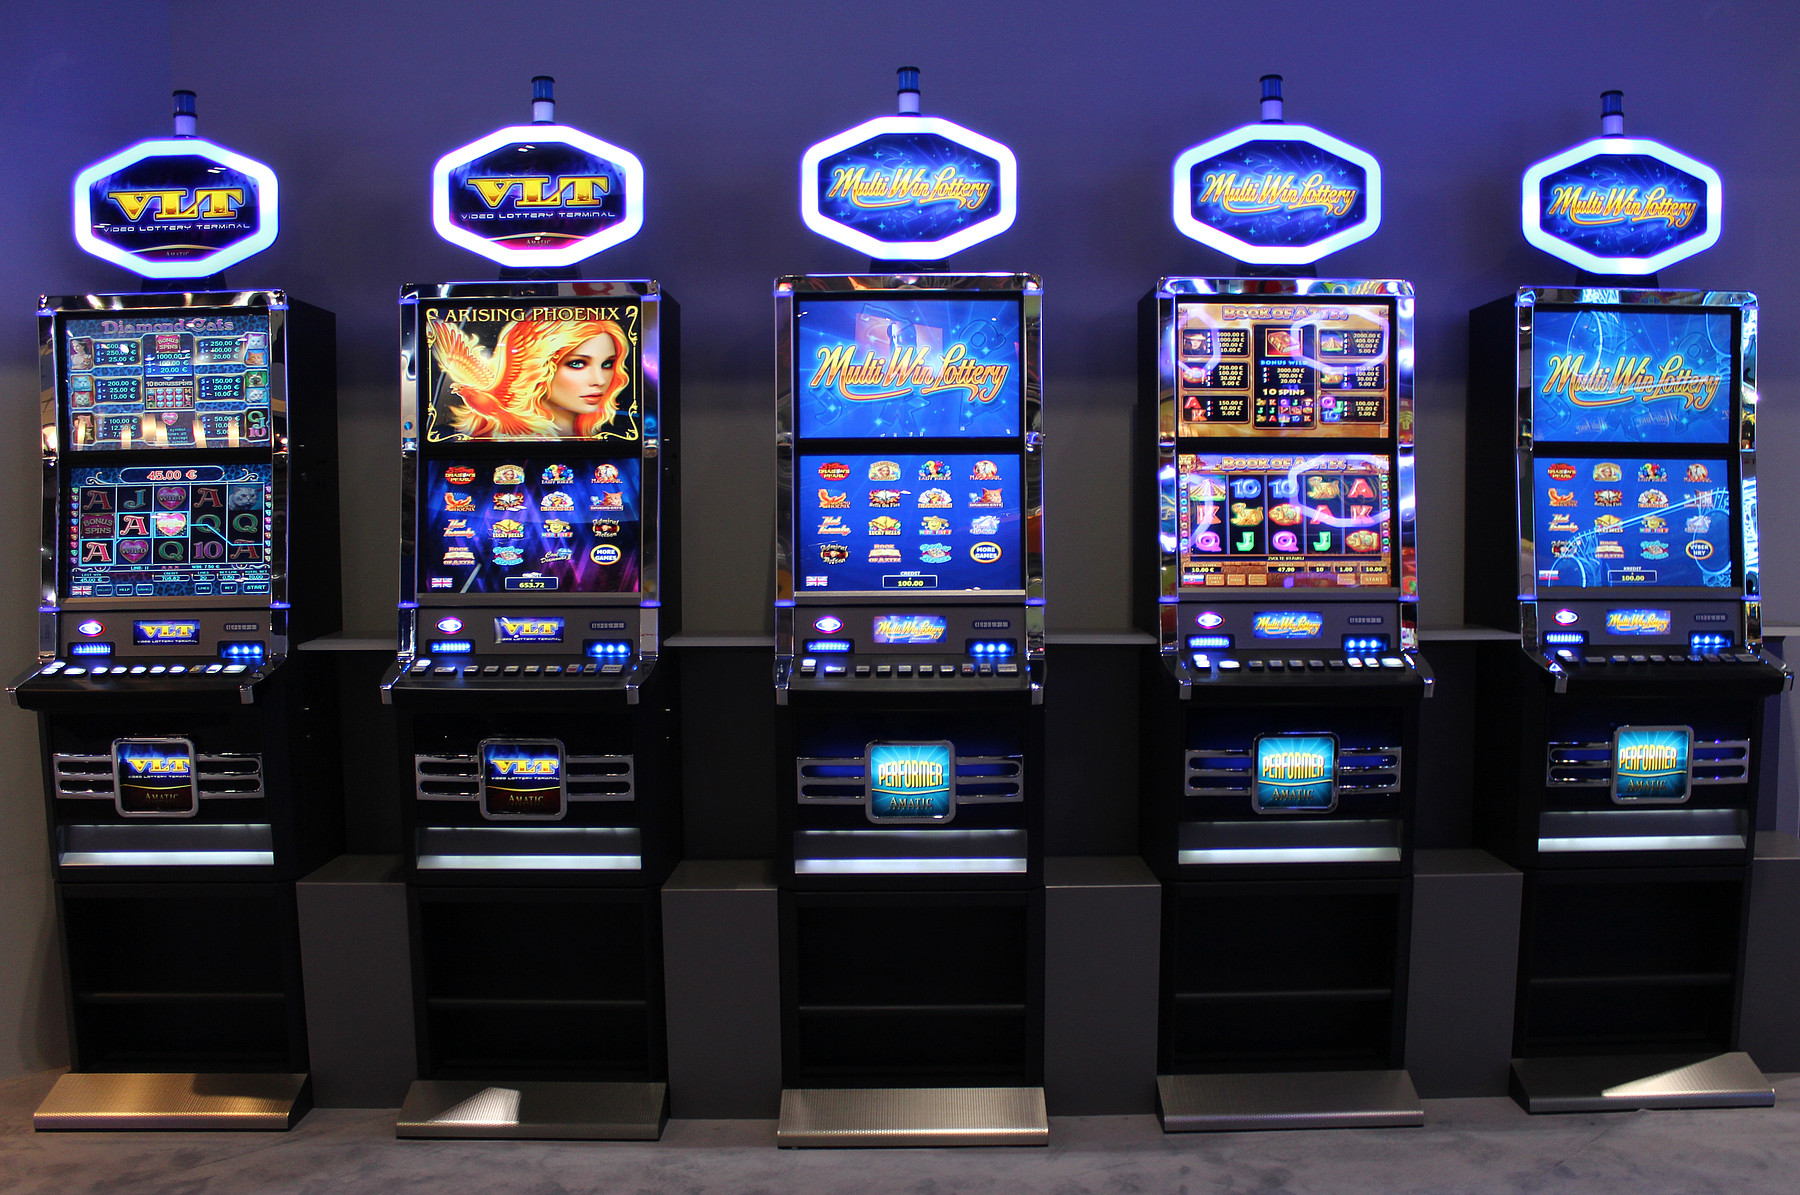 5 euro free casino